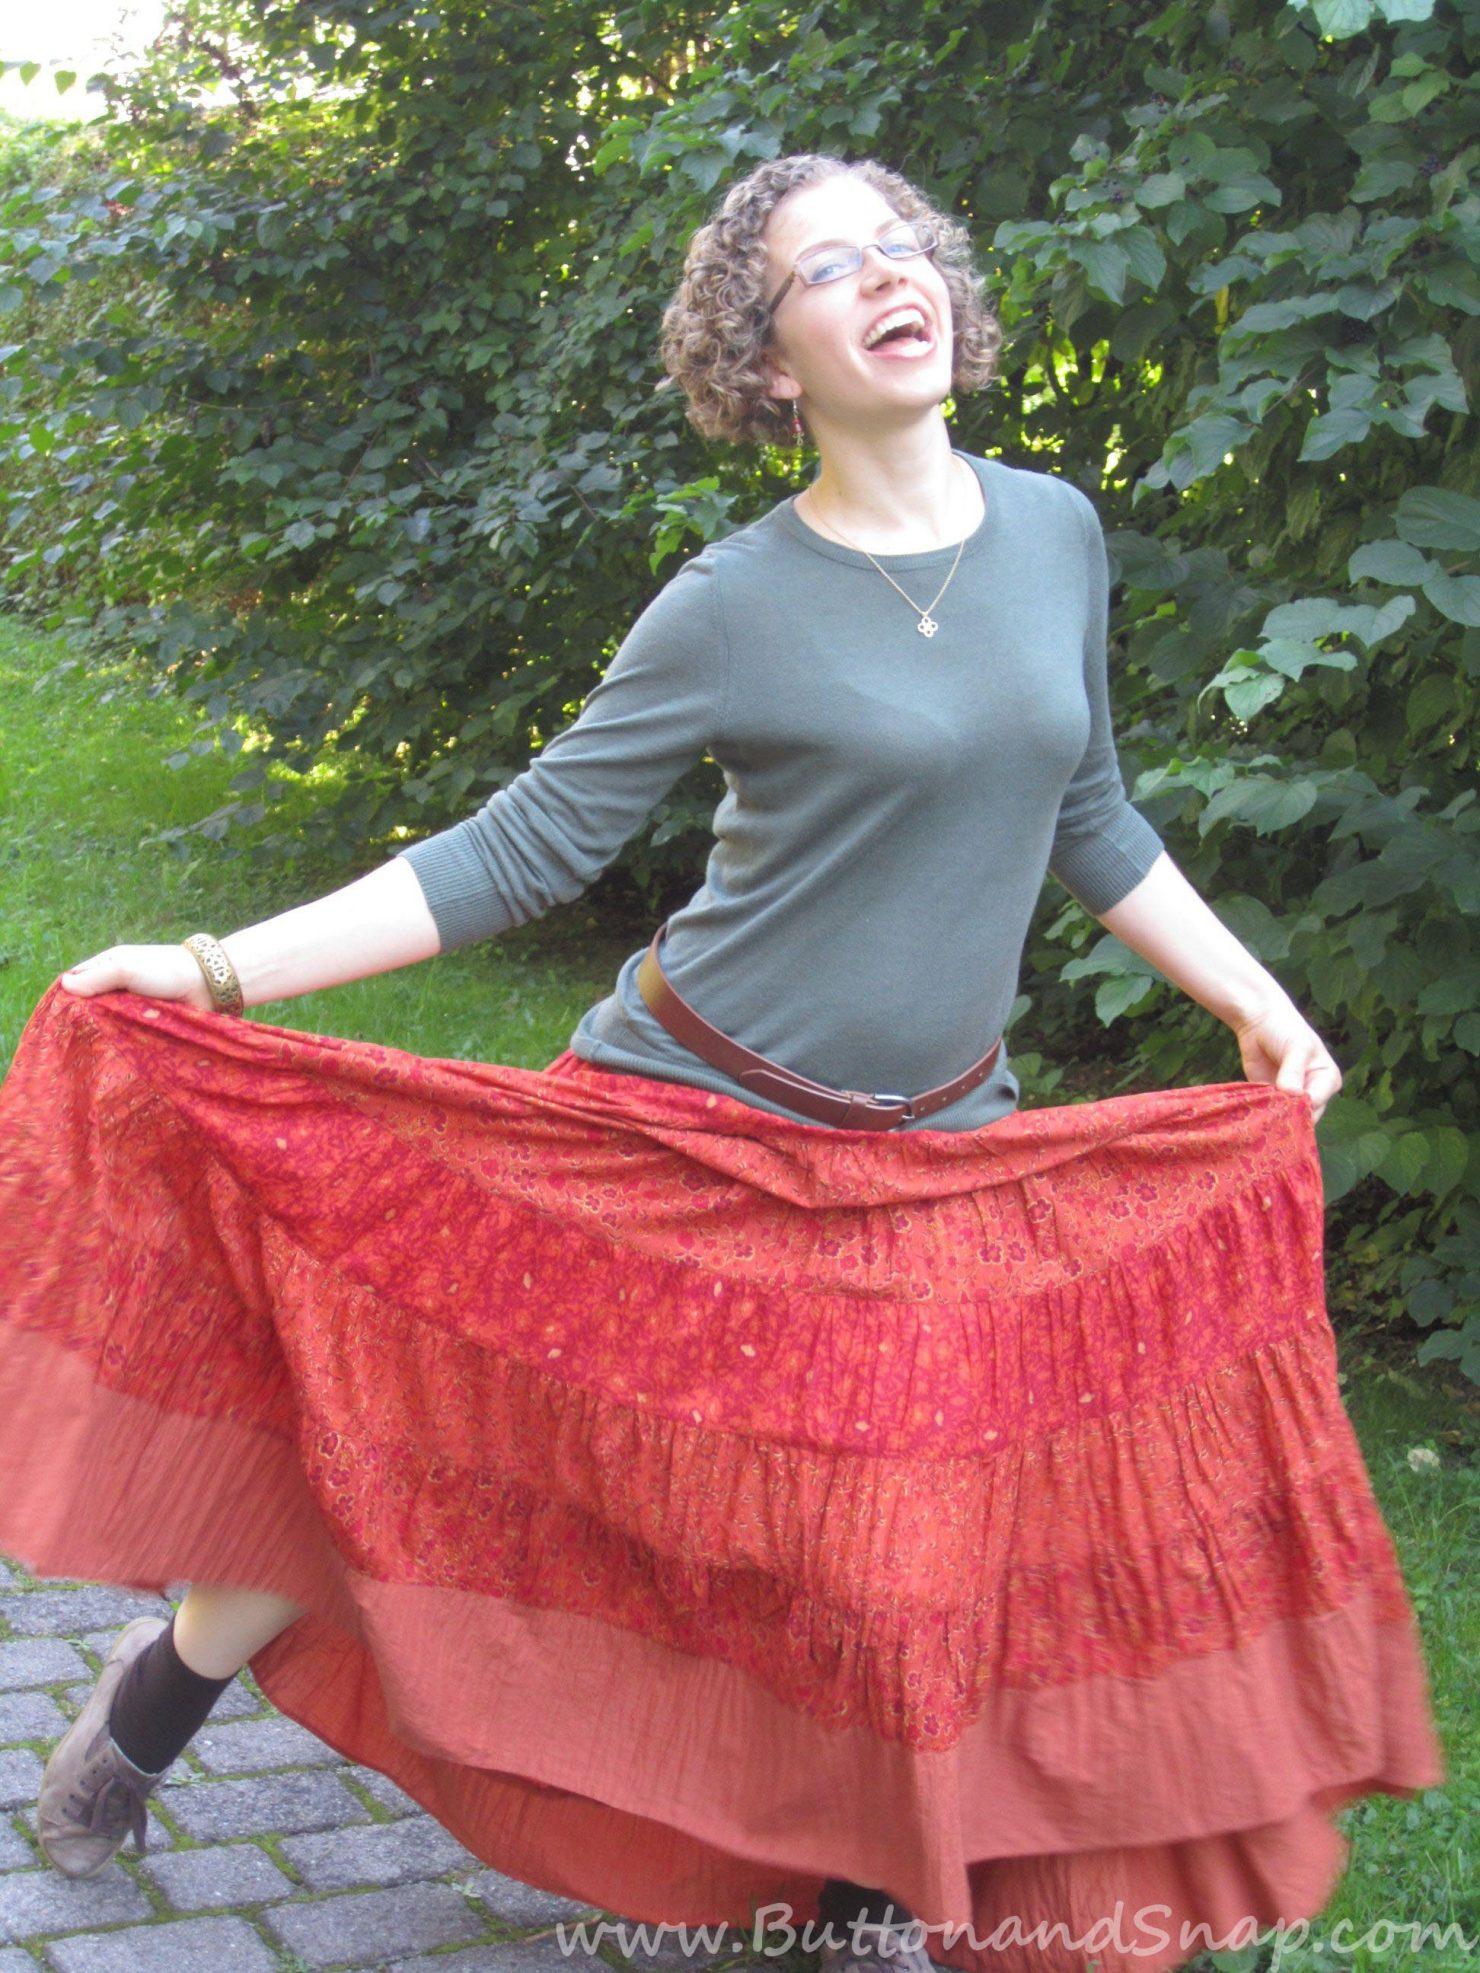 upcycling refashioning maxiskirt dress